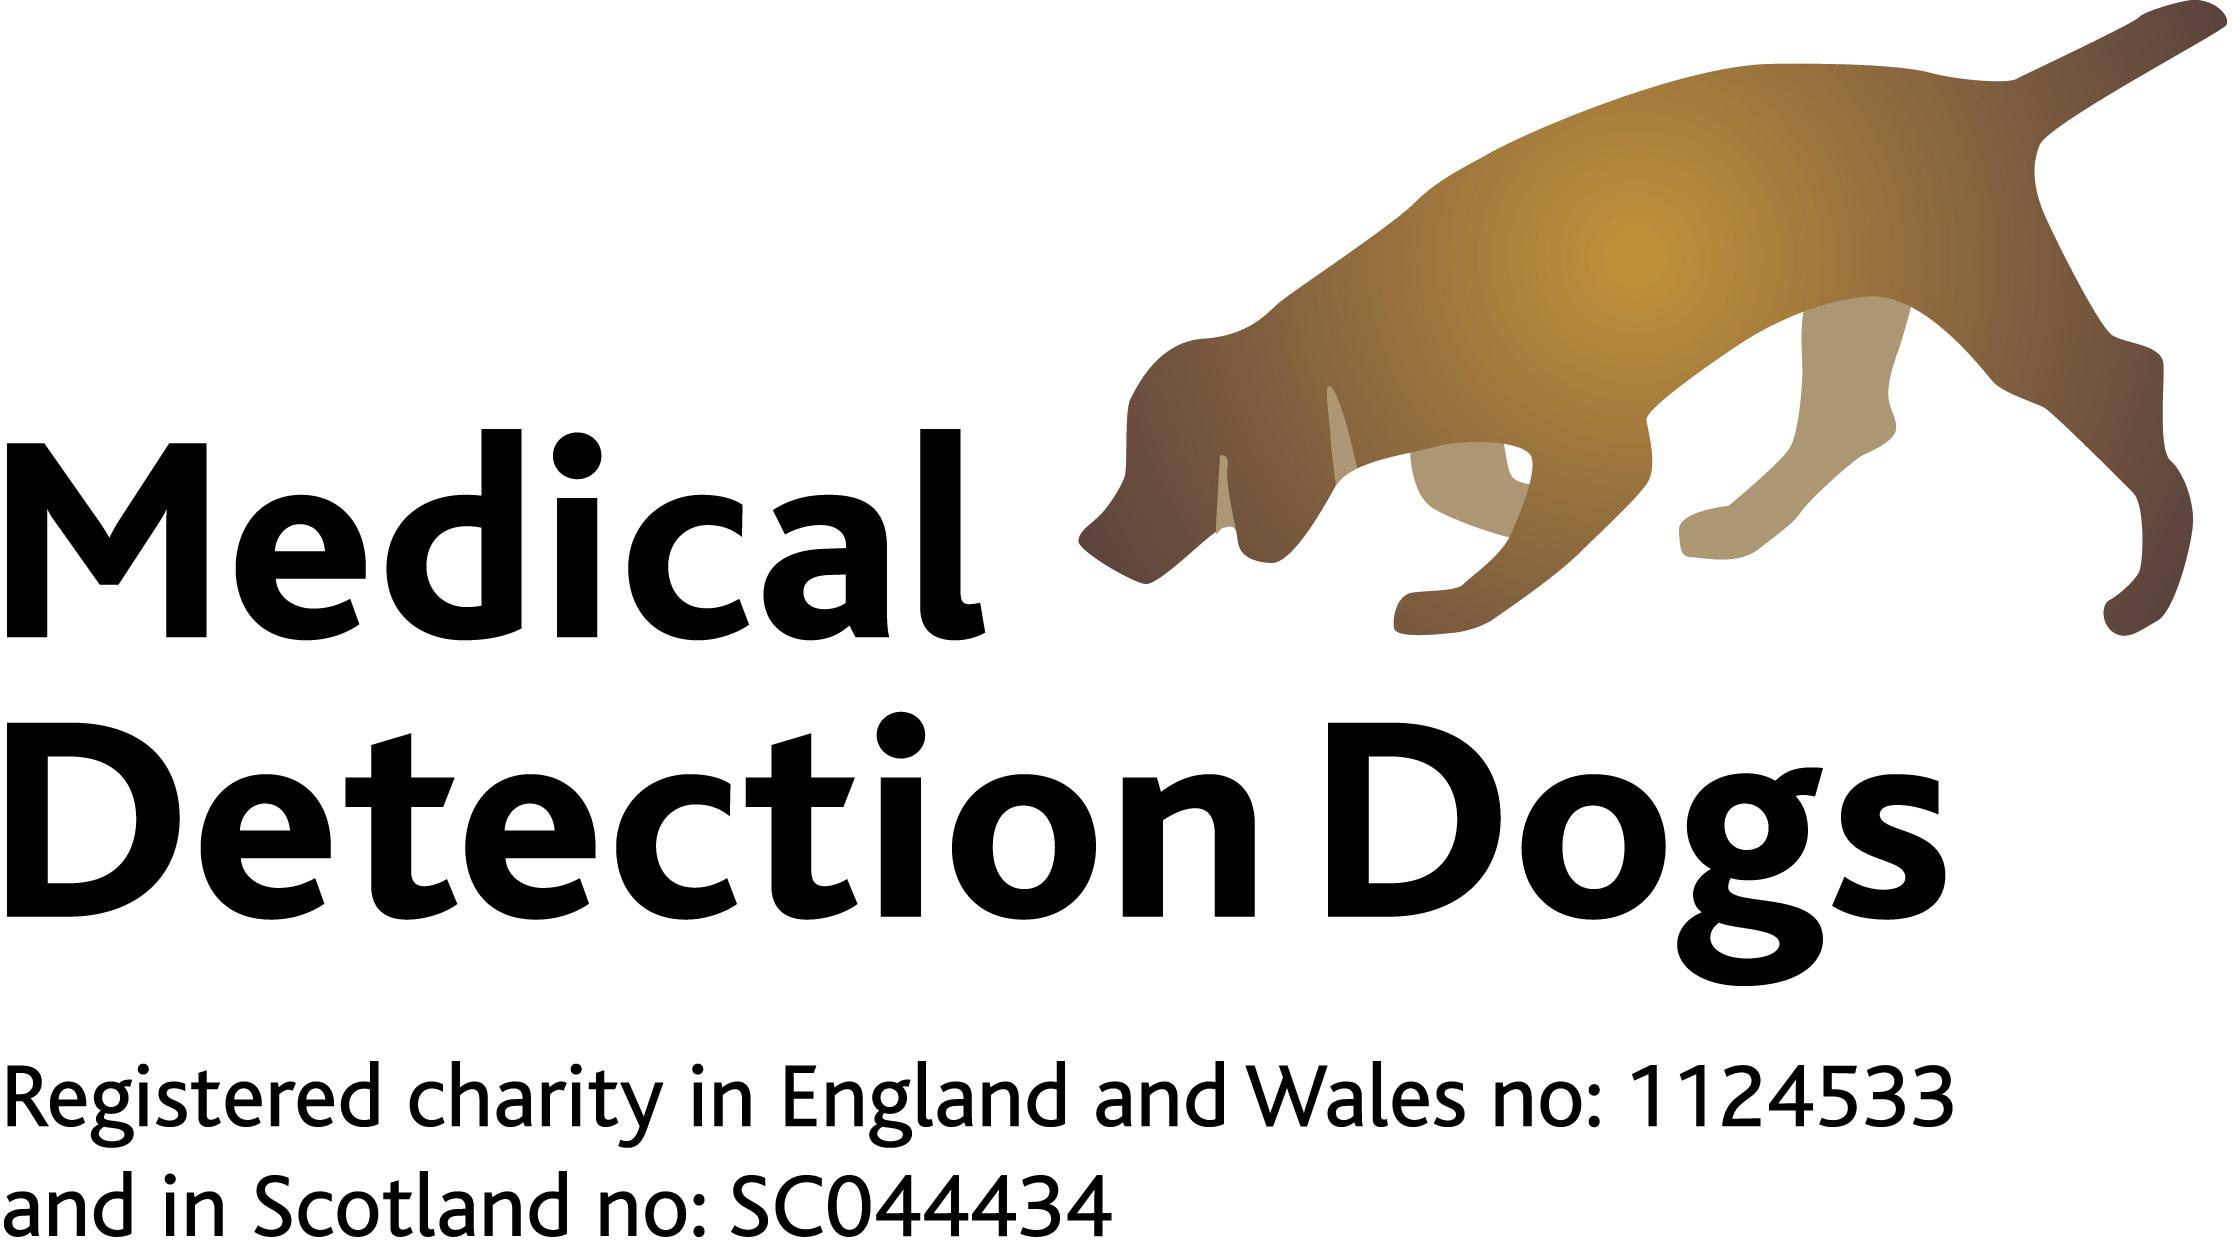 Medical Detection Dogs logo